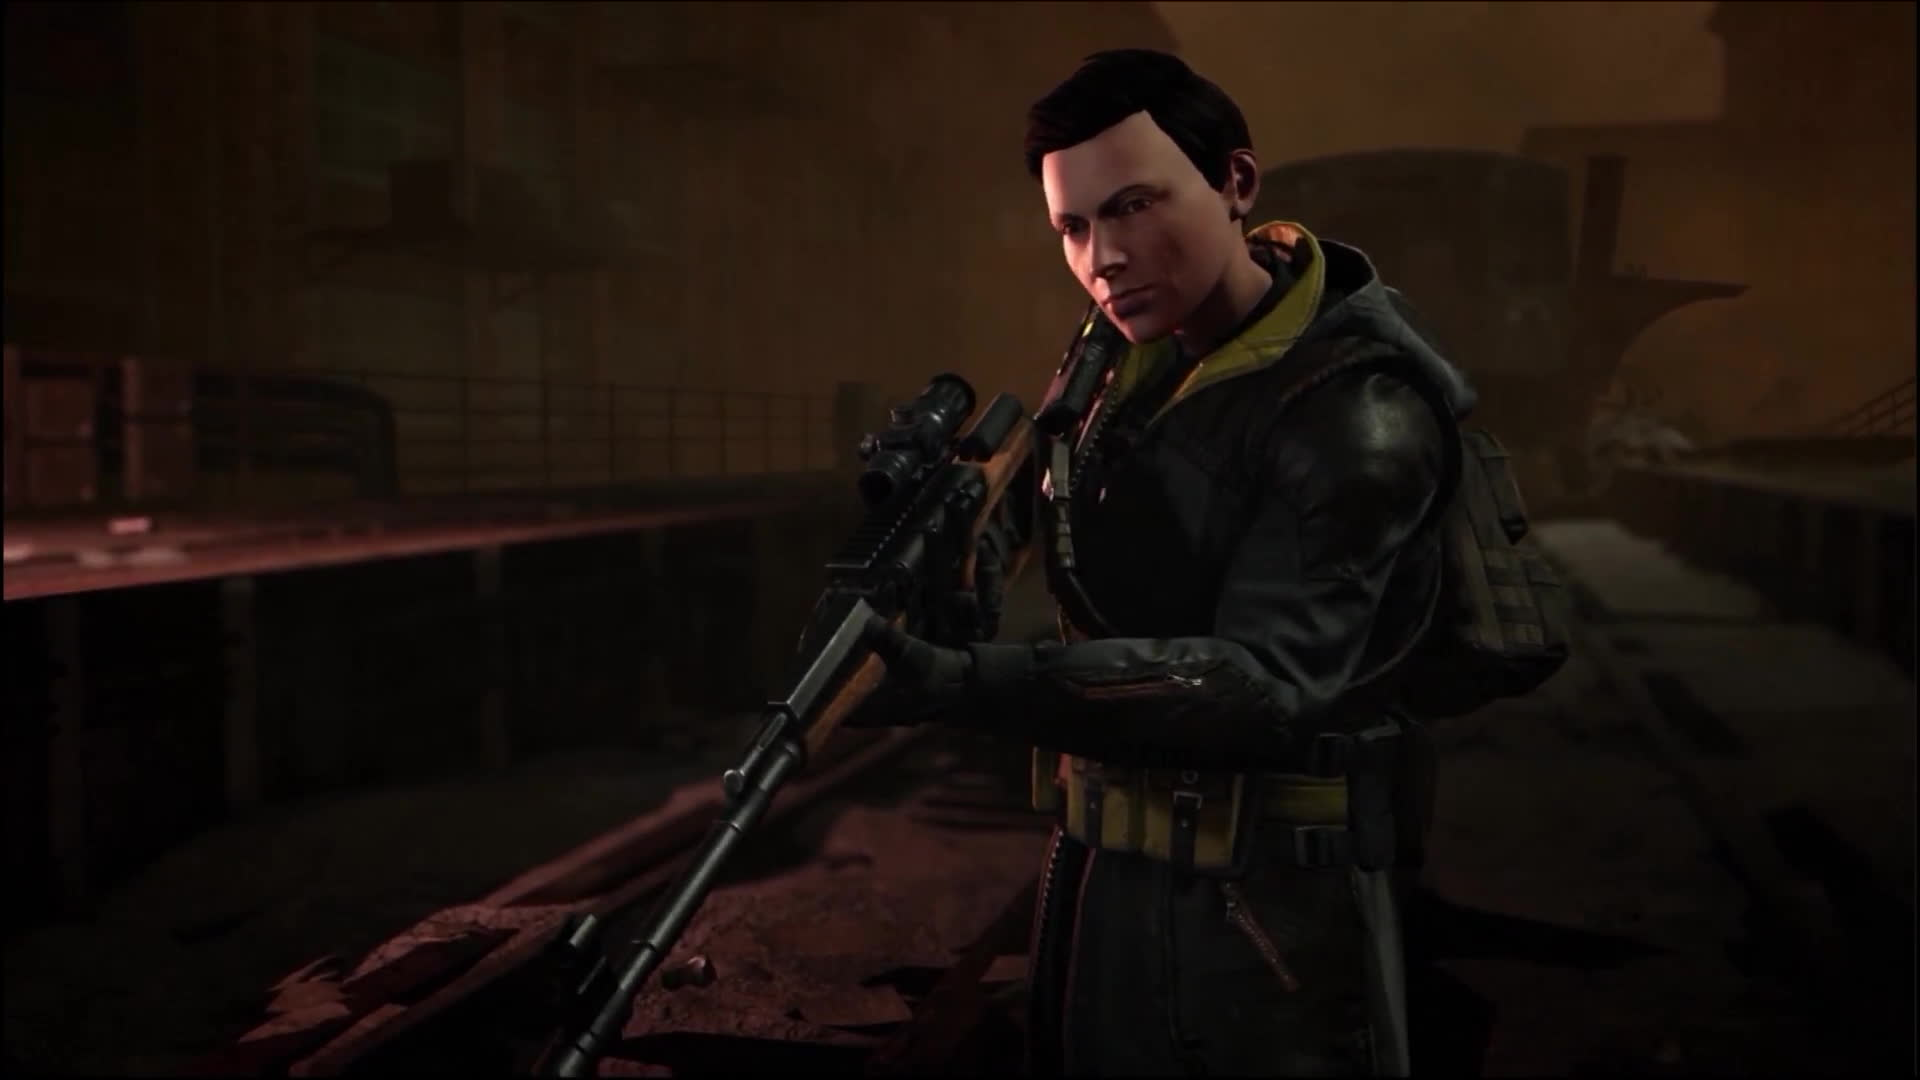 game, war of the chosen, xcom, XCOM Bullet-Dodge Scene GIFs